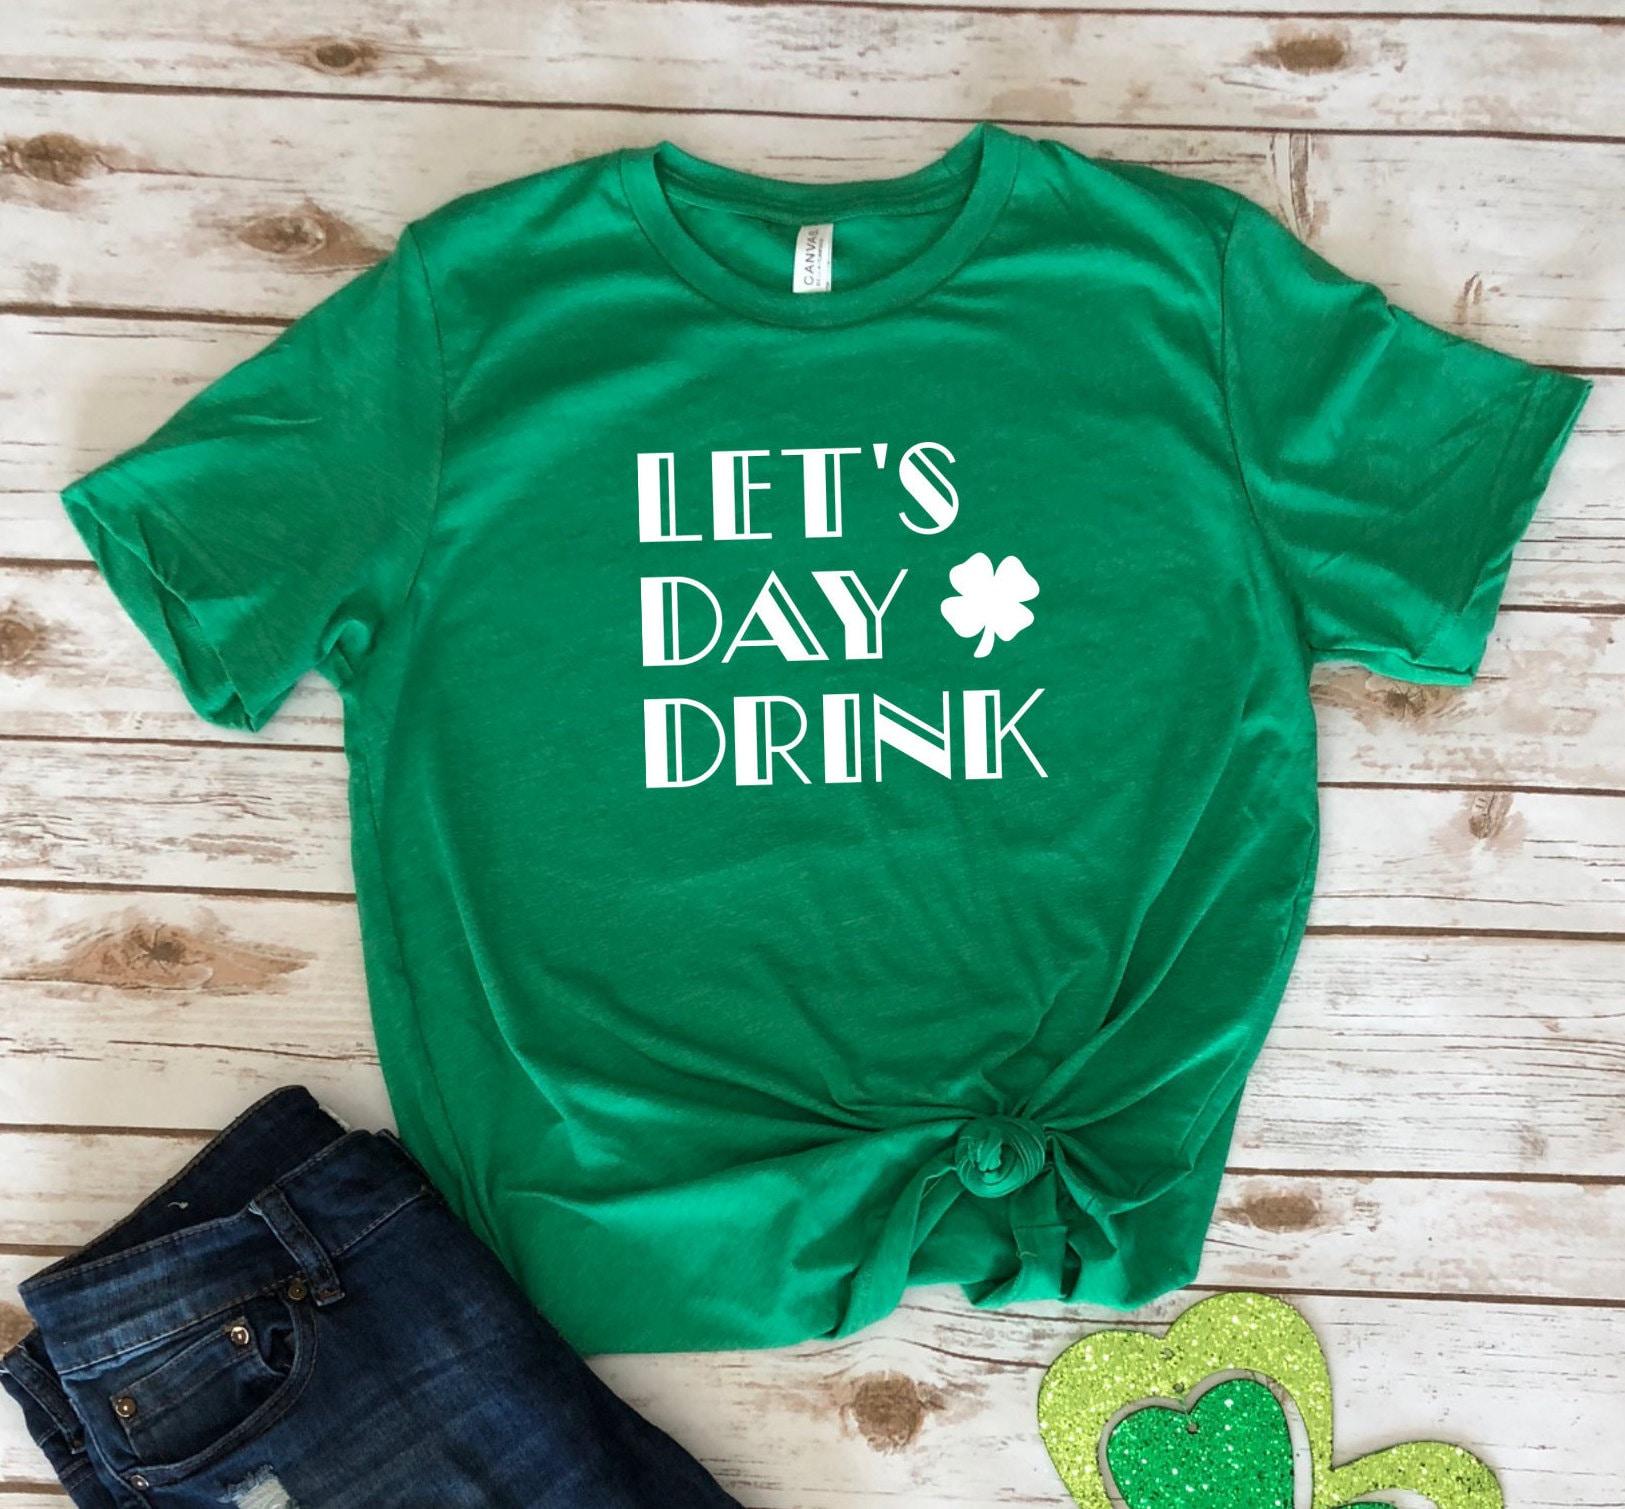 30b6f2f5 St Patricks Day Shirt Women, St Pattys Day shirt women, Funny St Patricks  Day Shirt Women, Womens St Patricks Day Shirt, Funny Shirt Women